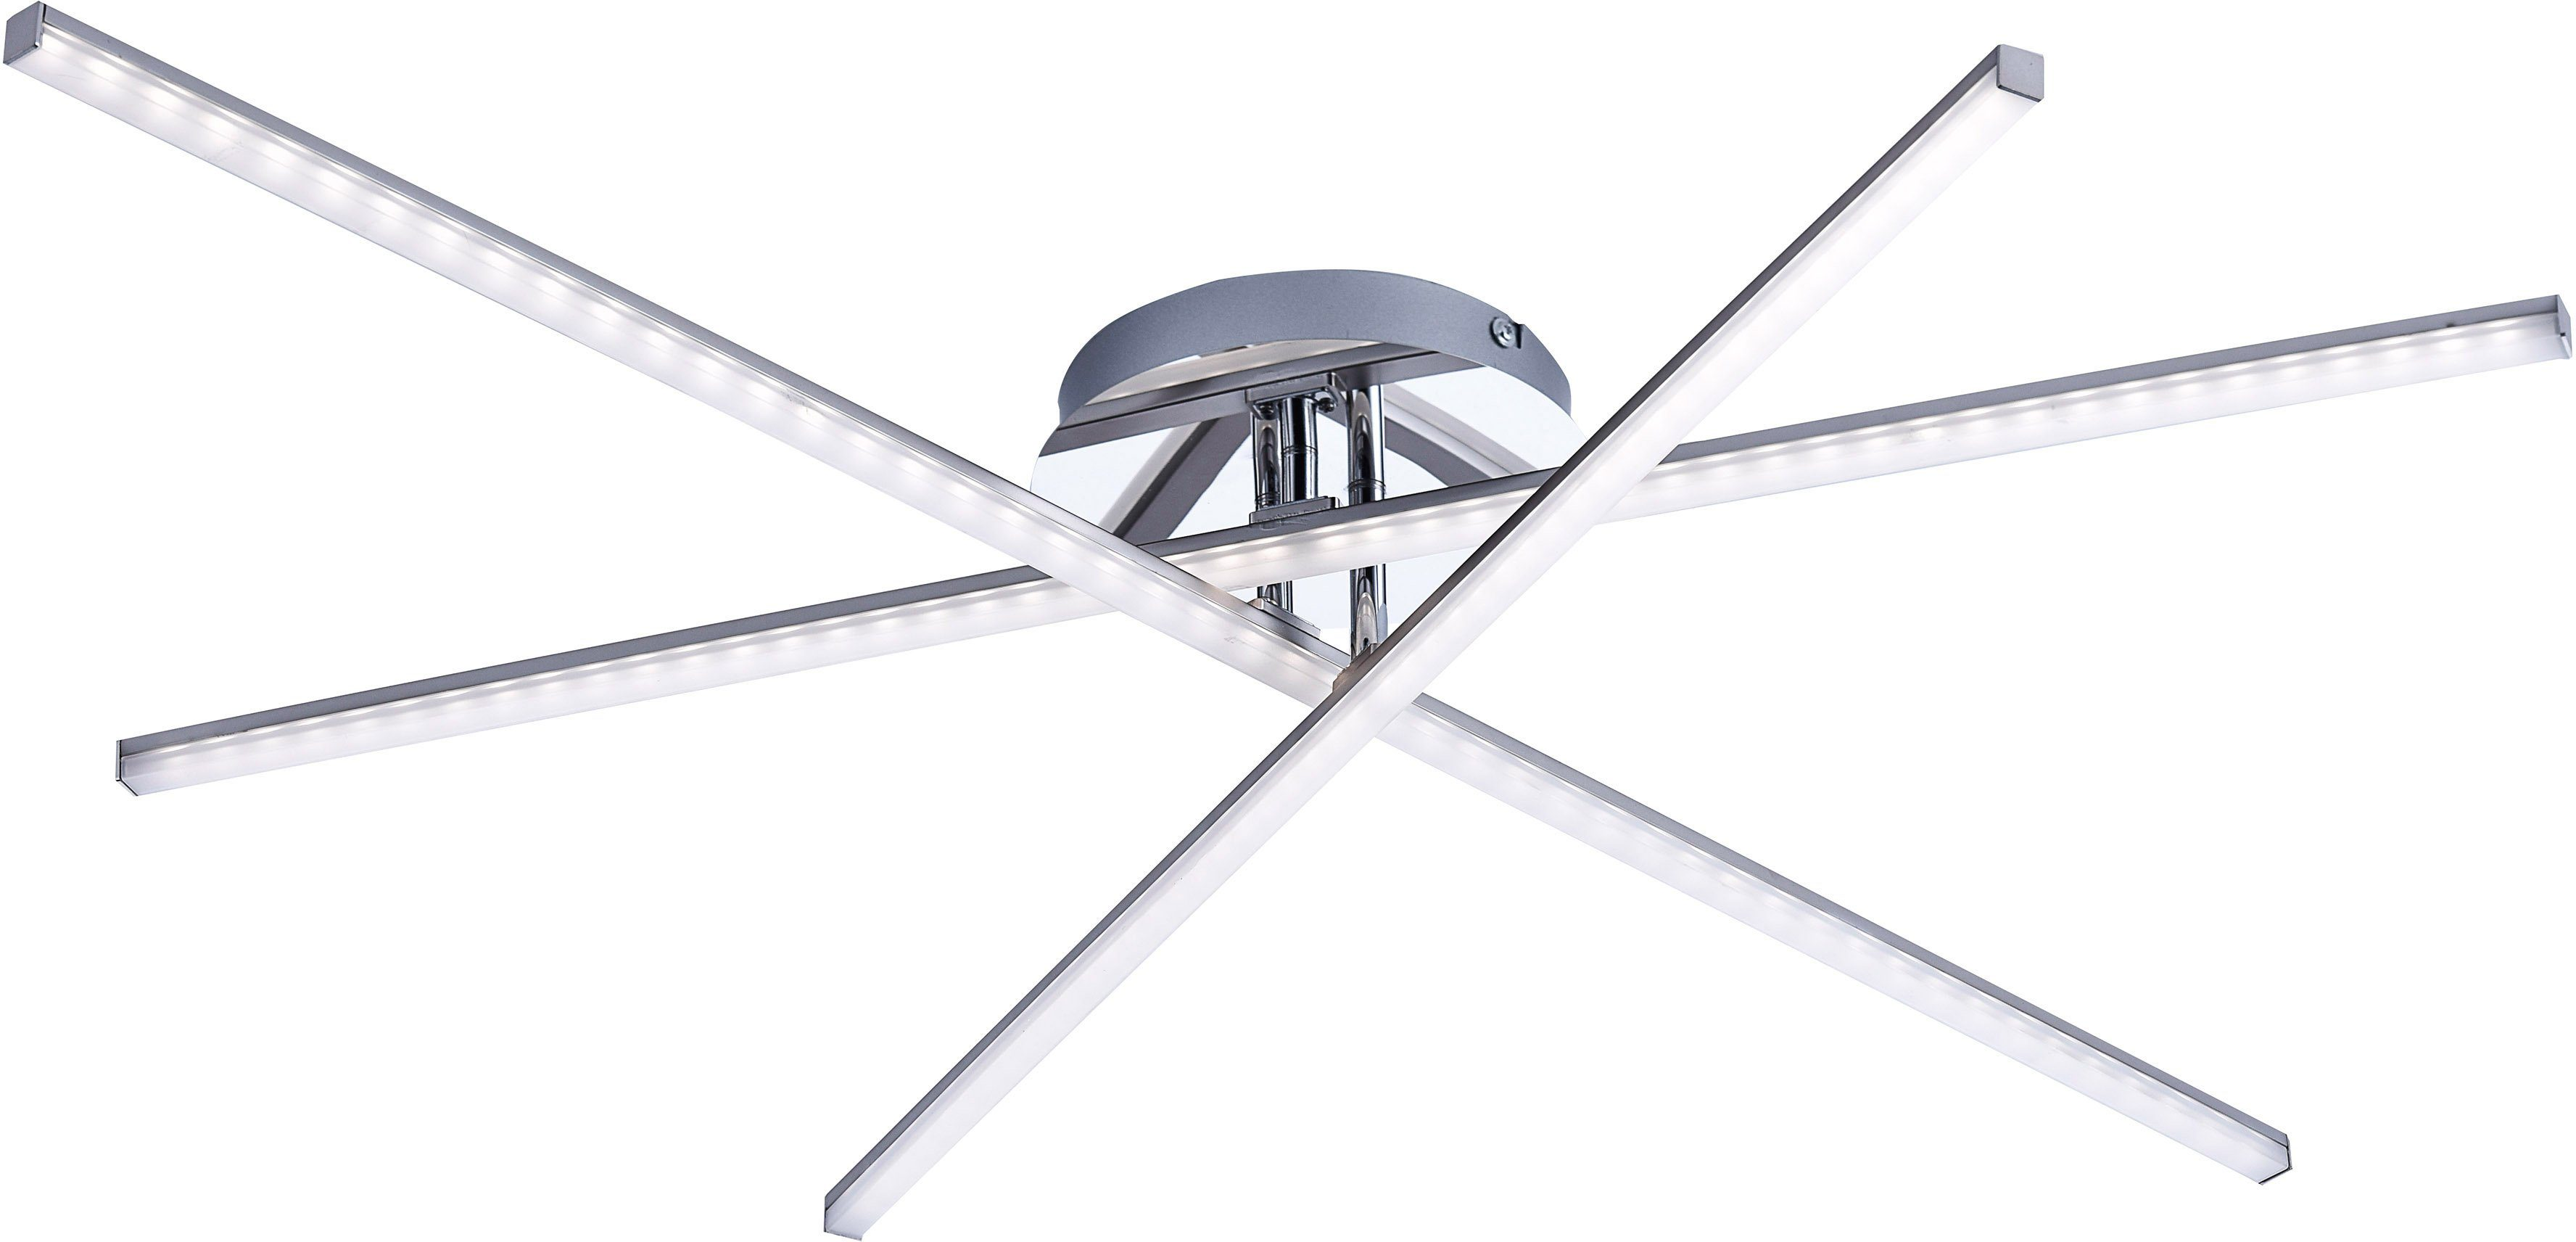 Leuchten Direkt LED-Deckenleuchte, 3flg., »Simon«